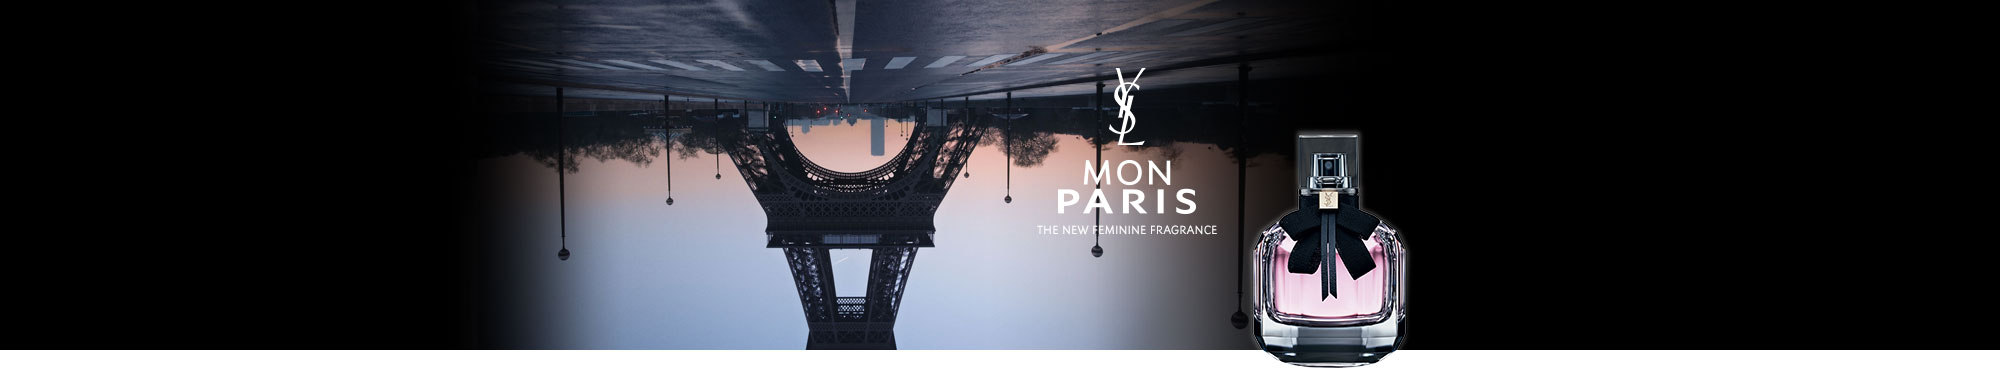 ysl-mon-paris-02